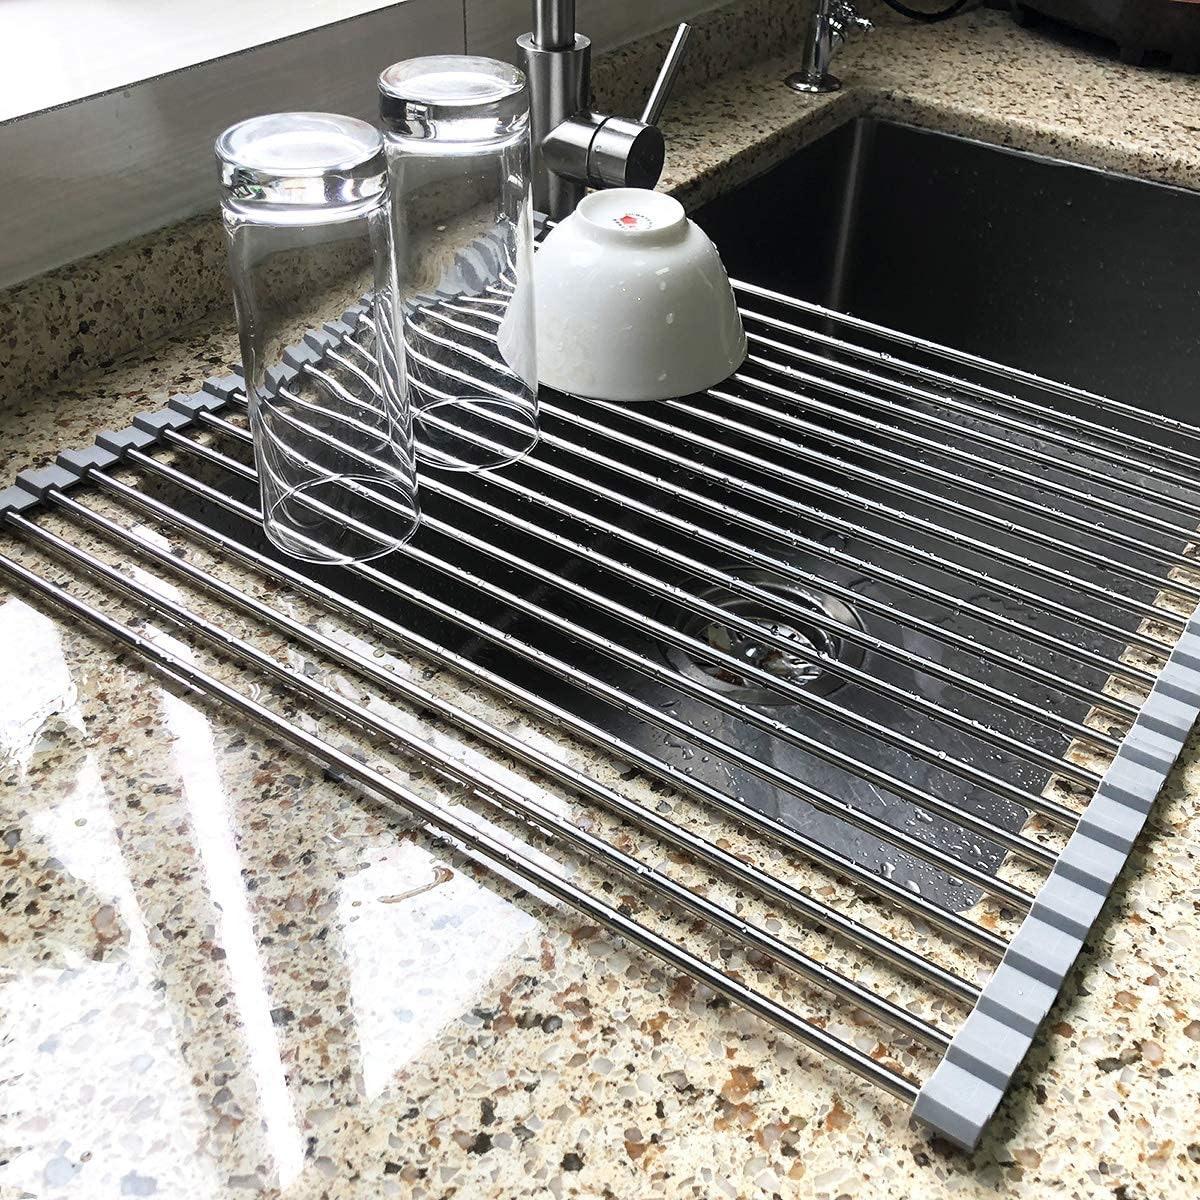 Attom Tech Home Roll-Up Dish Rack